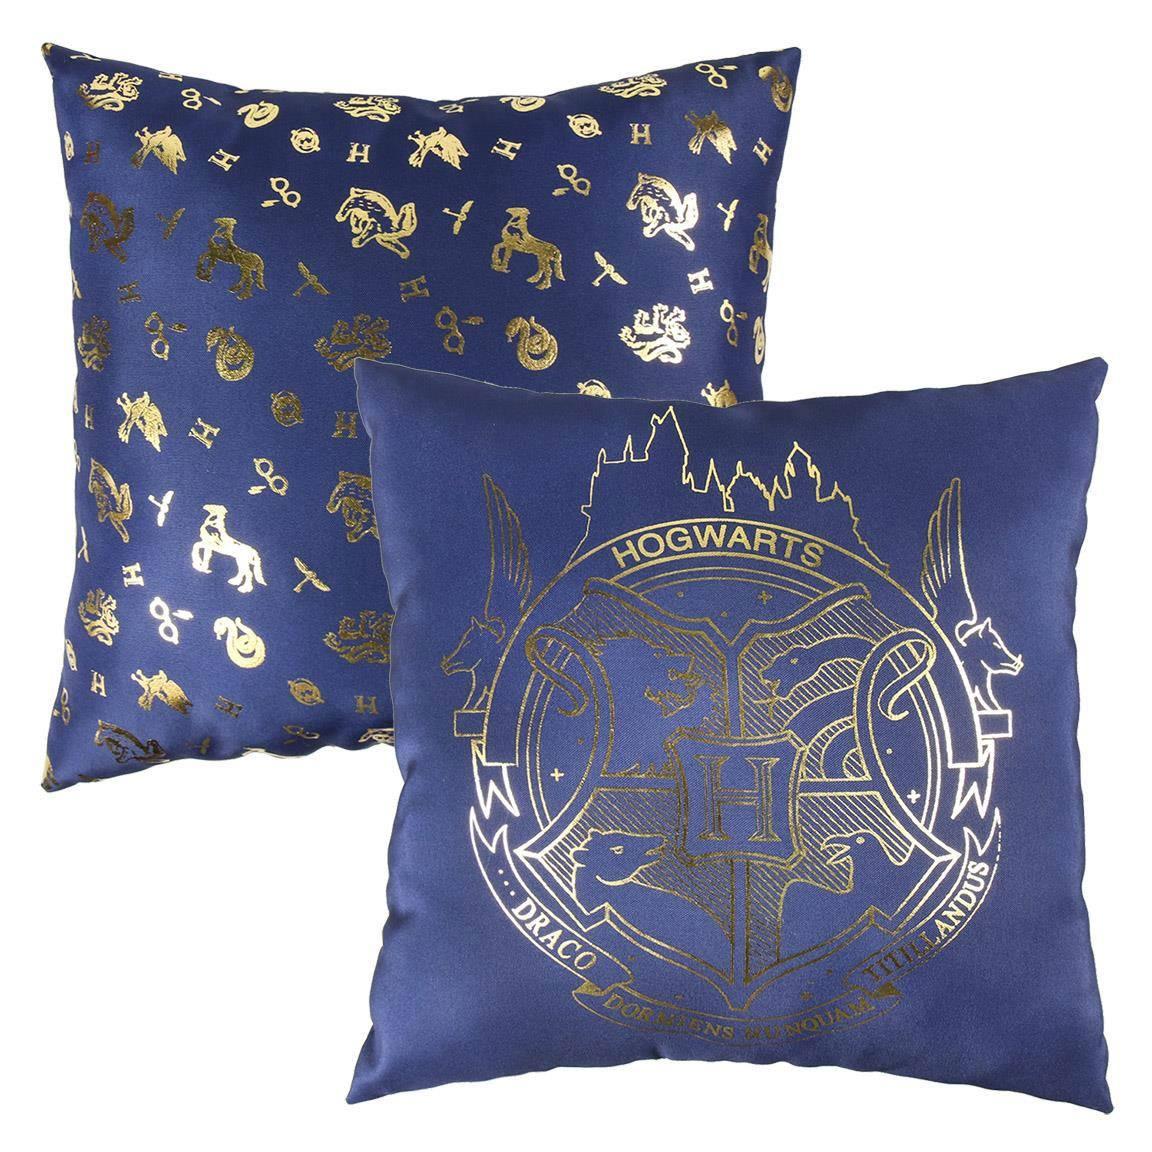 Harry Potter Premium Pillow Hogwarts 40 x 40 cm